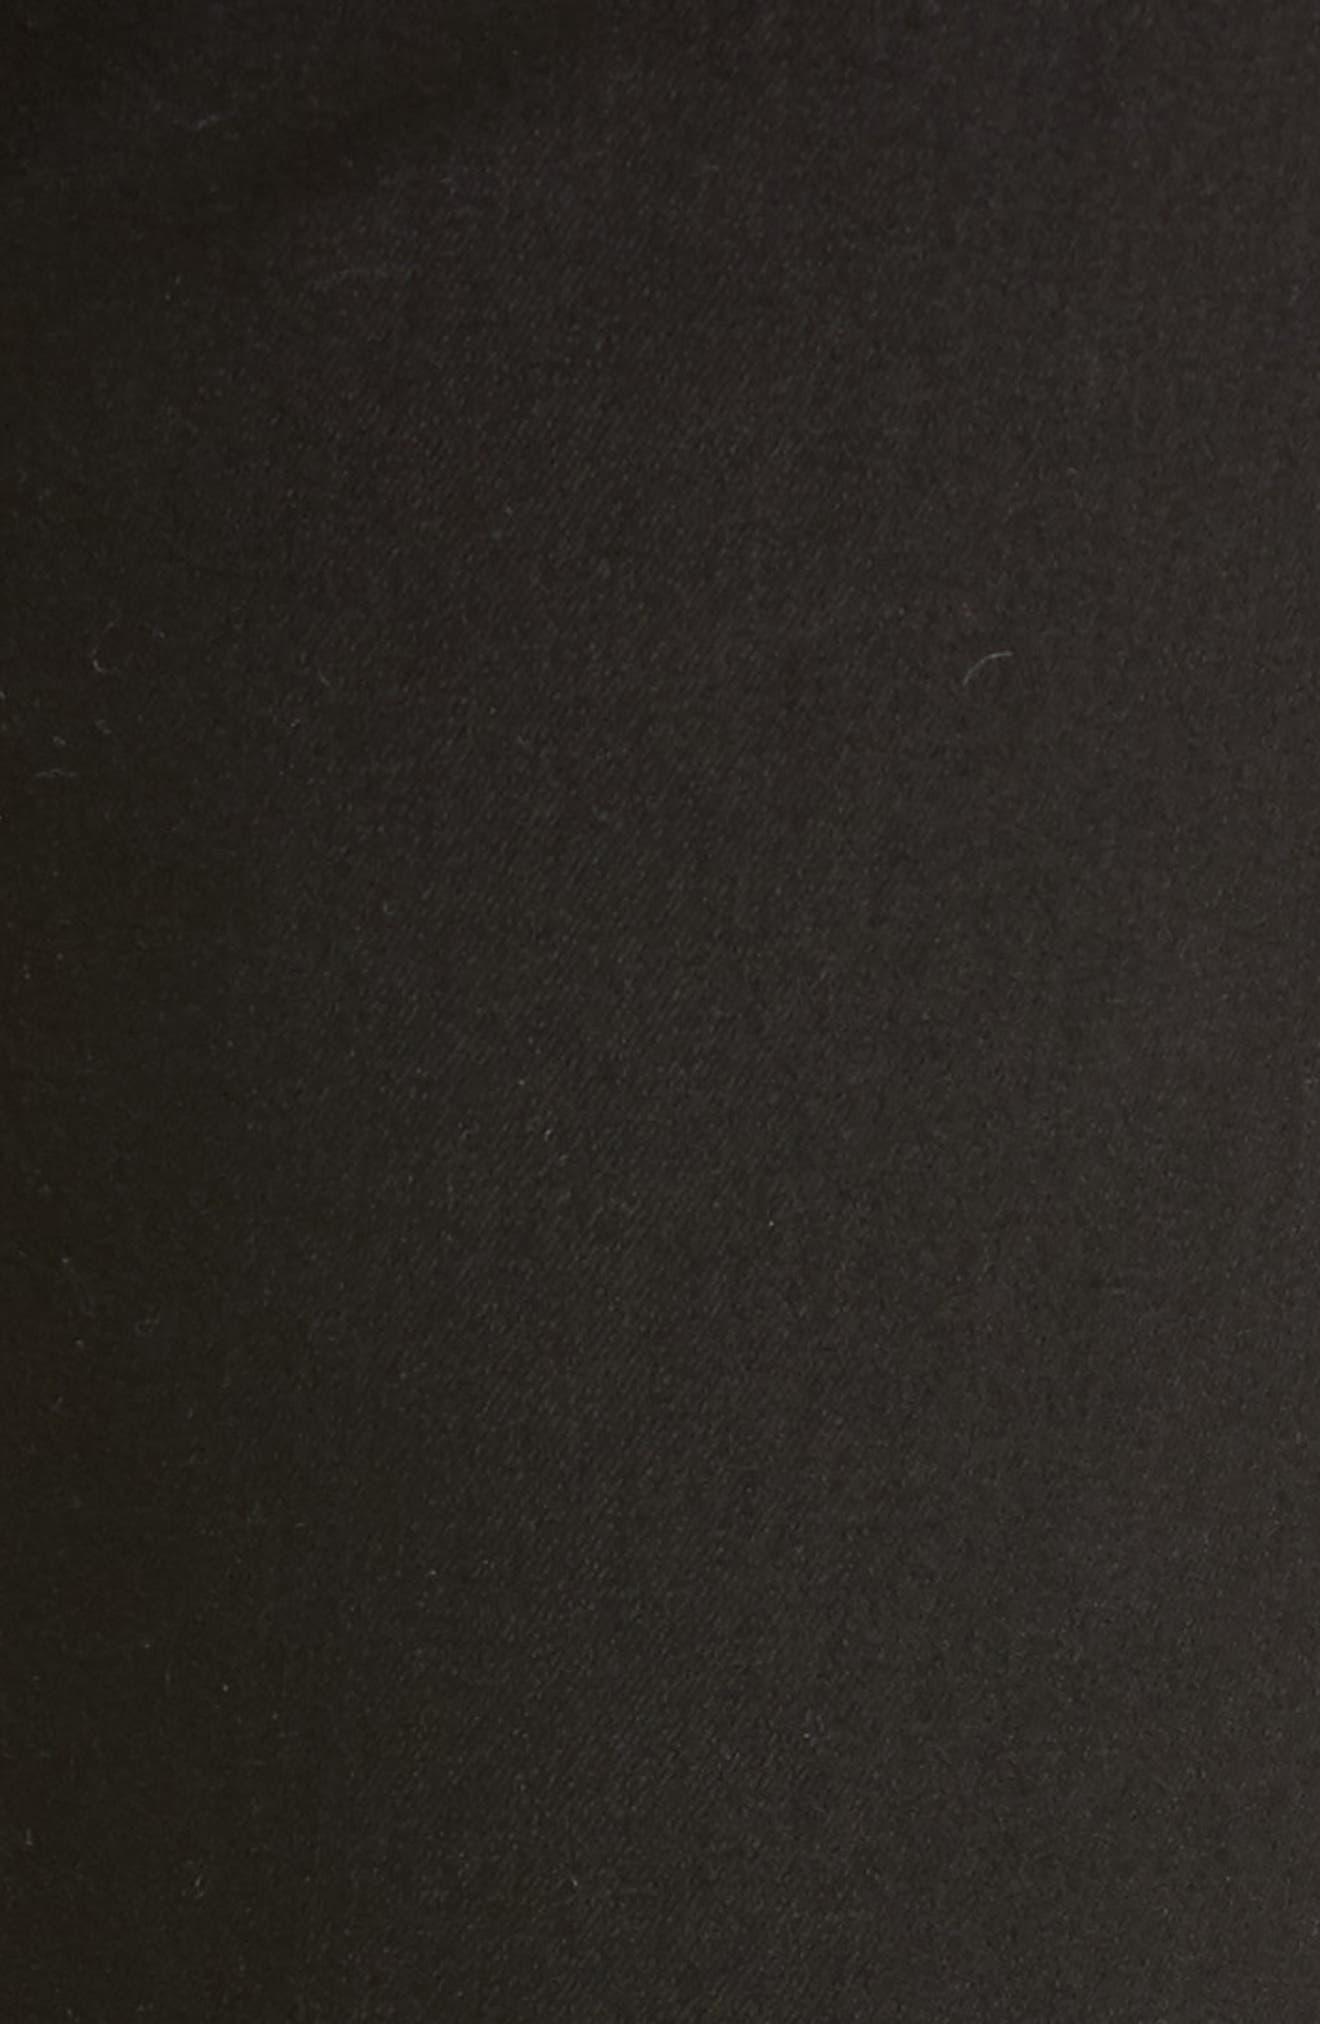 Carlie High Waist Skinny Jeans,                             Alternate thumbnail 5, color,                             011